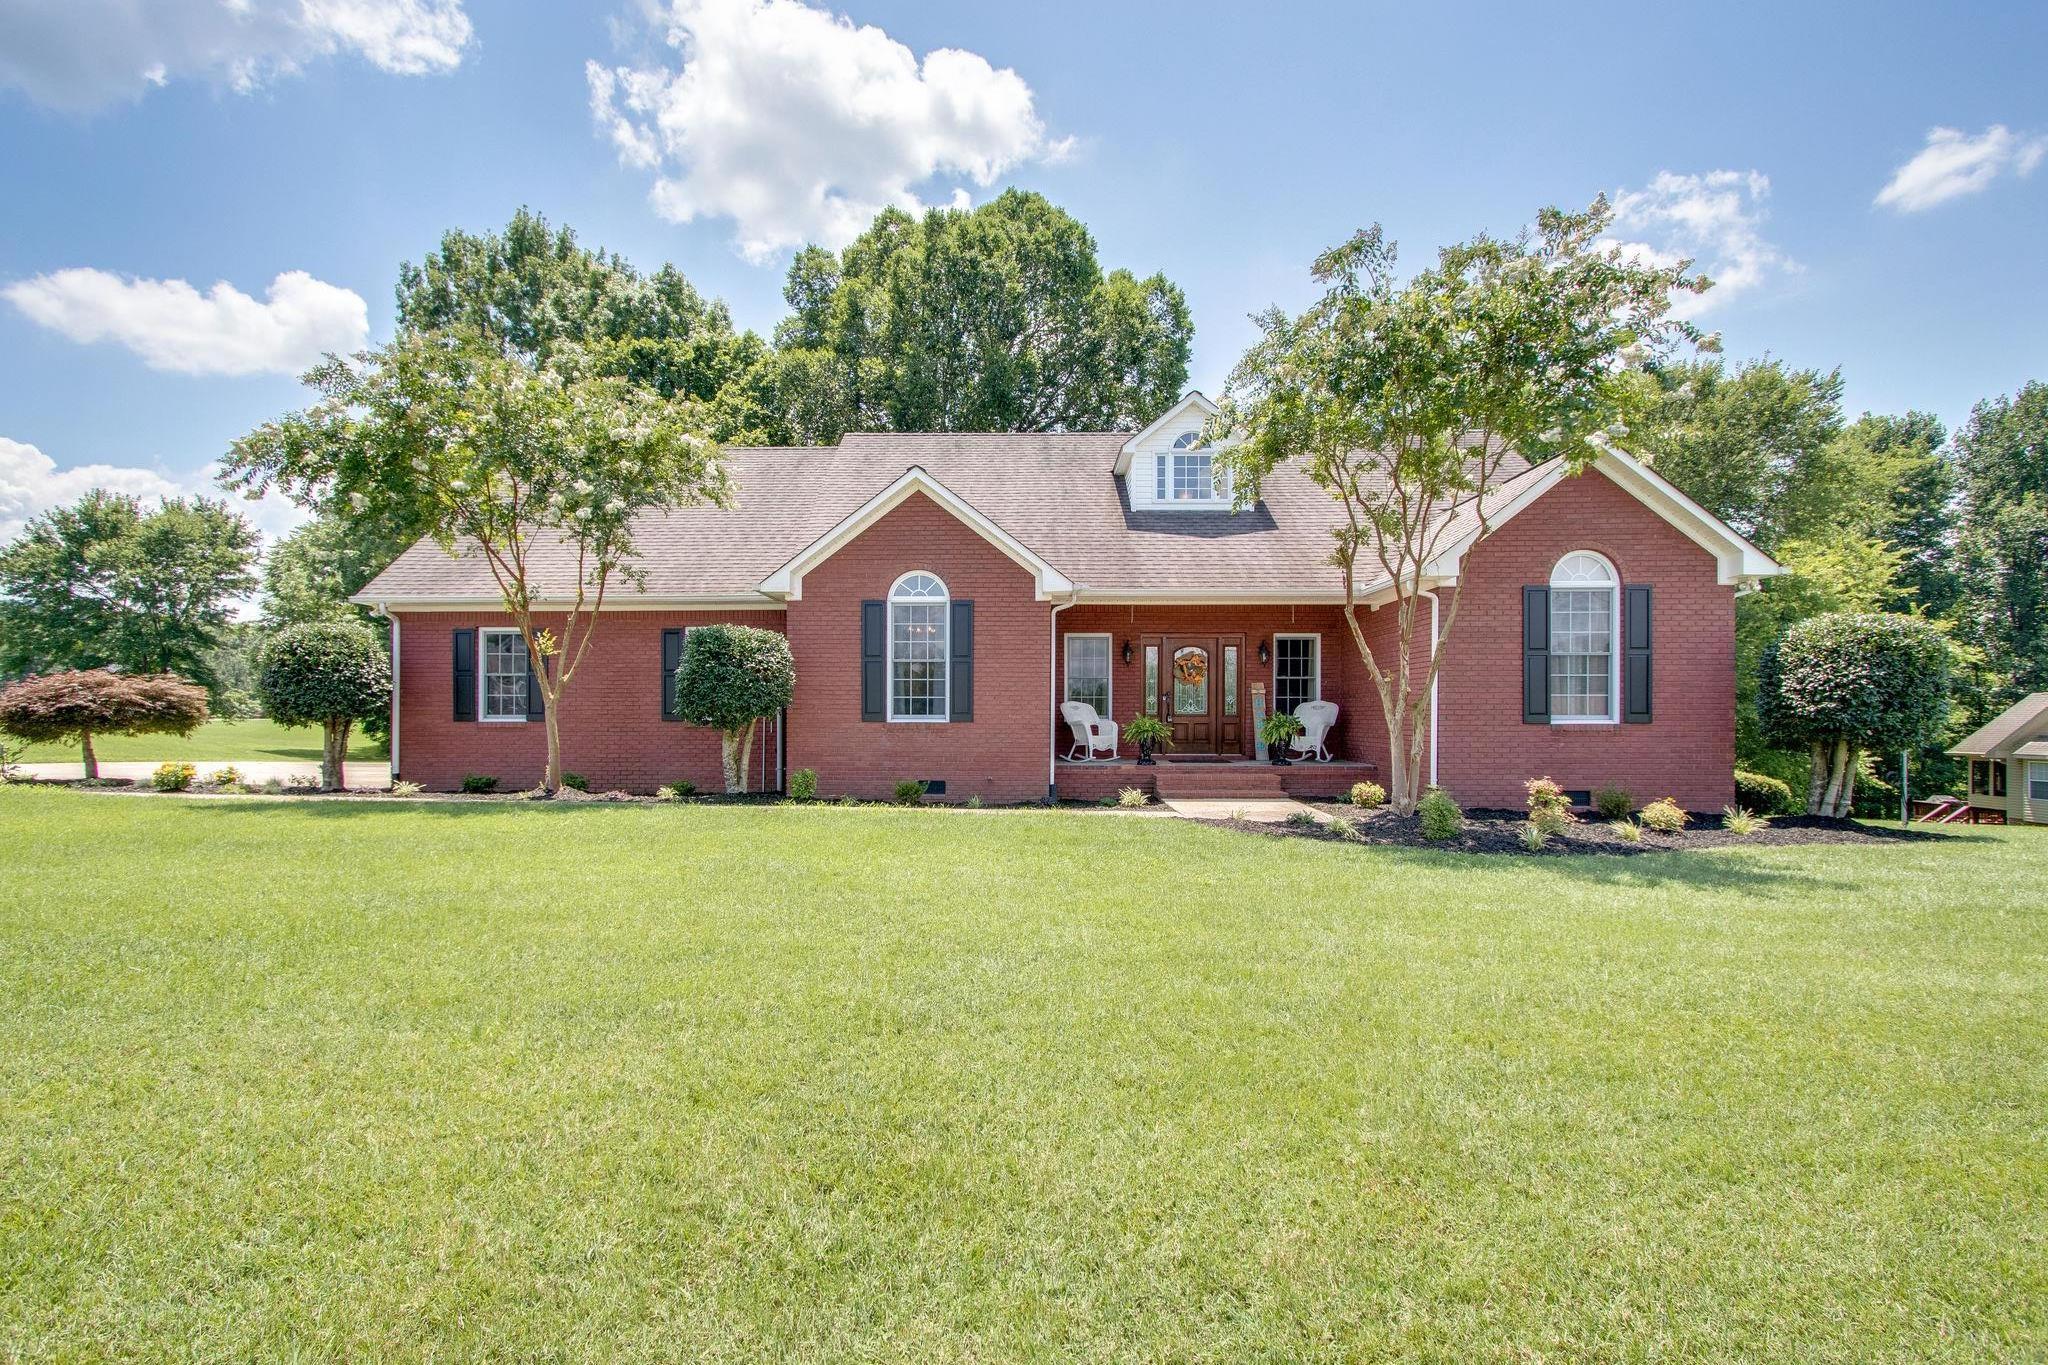 105 Oakview Dr W., Brush Creek, TN 38547 - Brush Creek, TN real estate listing